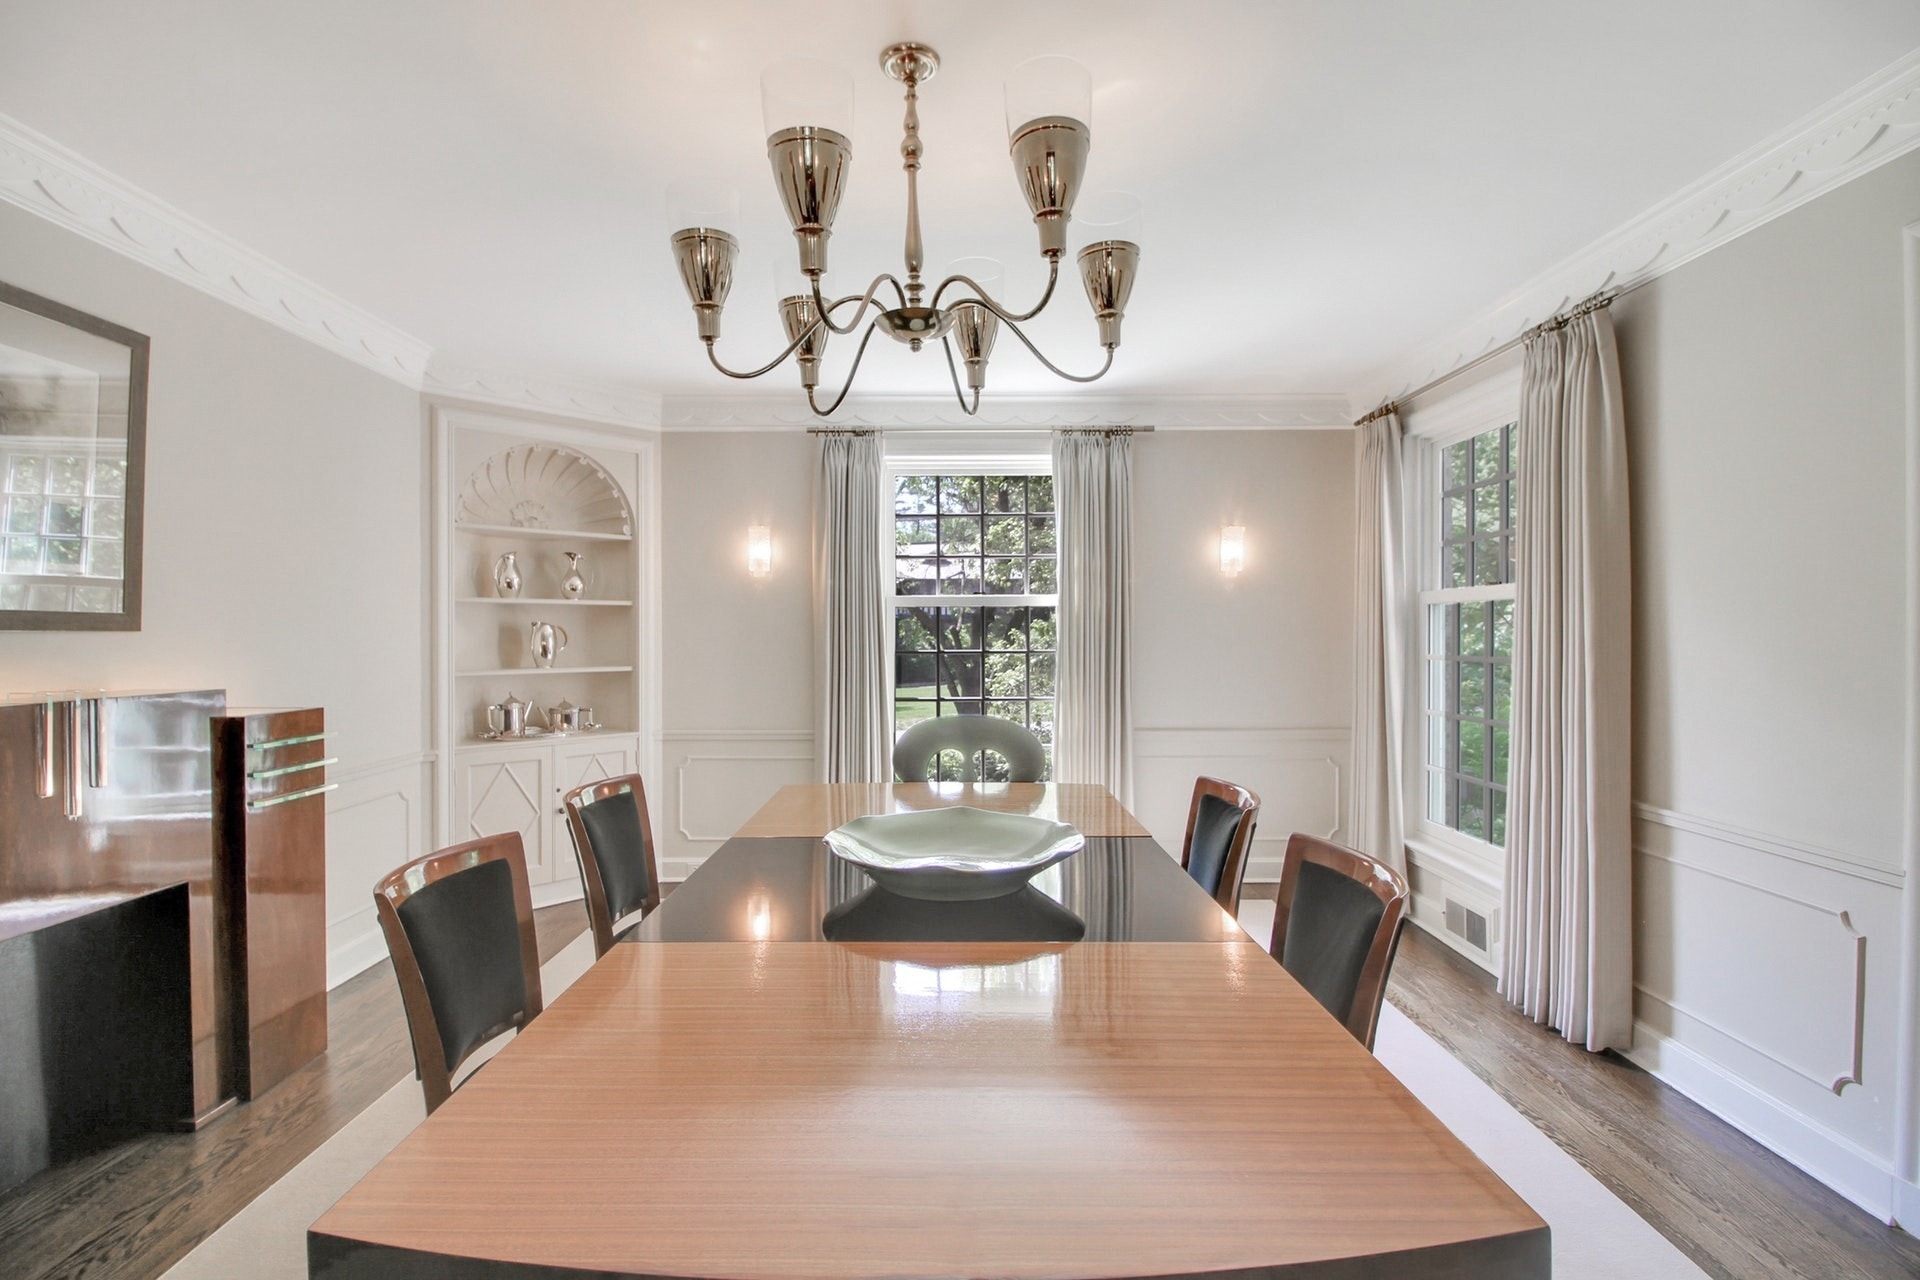 74 Taylor Road Dining Room